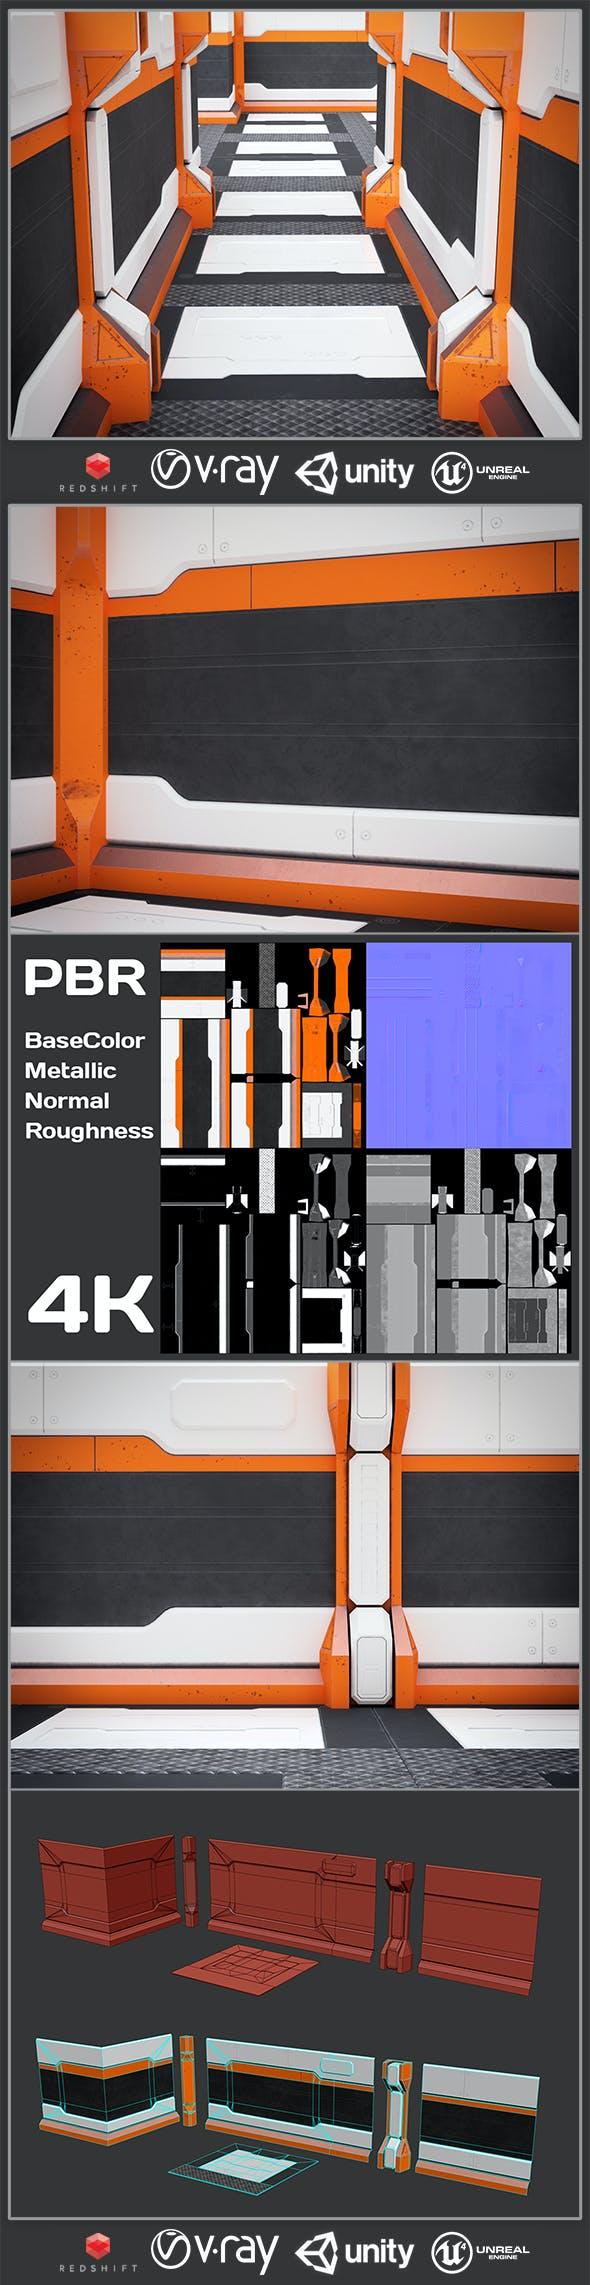 Spaceship Sci-fi interior kitbash set 01 Low-poly - 3DOcean Item for Sale